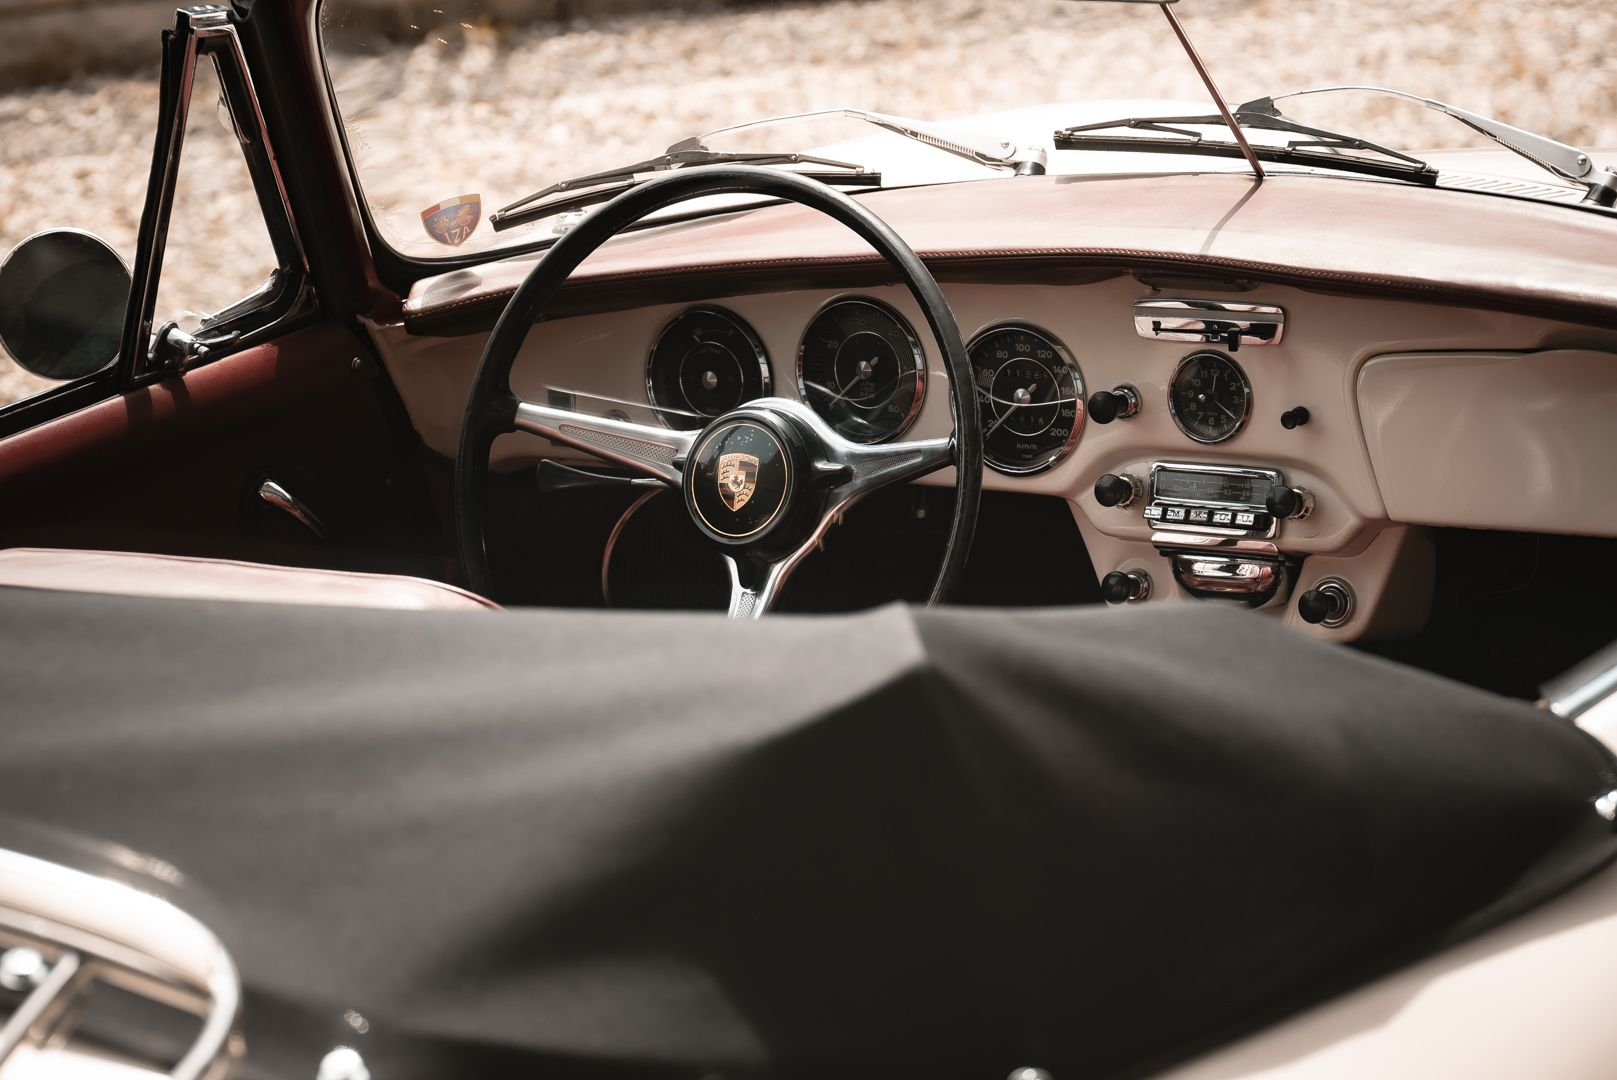 1964 PORSCHE 356 C Cabriolet 1600 SC 75448